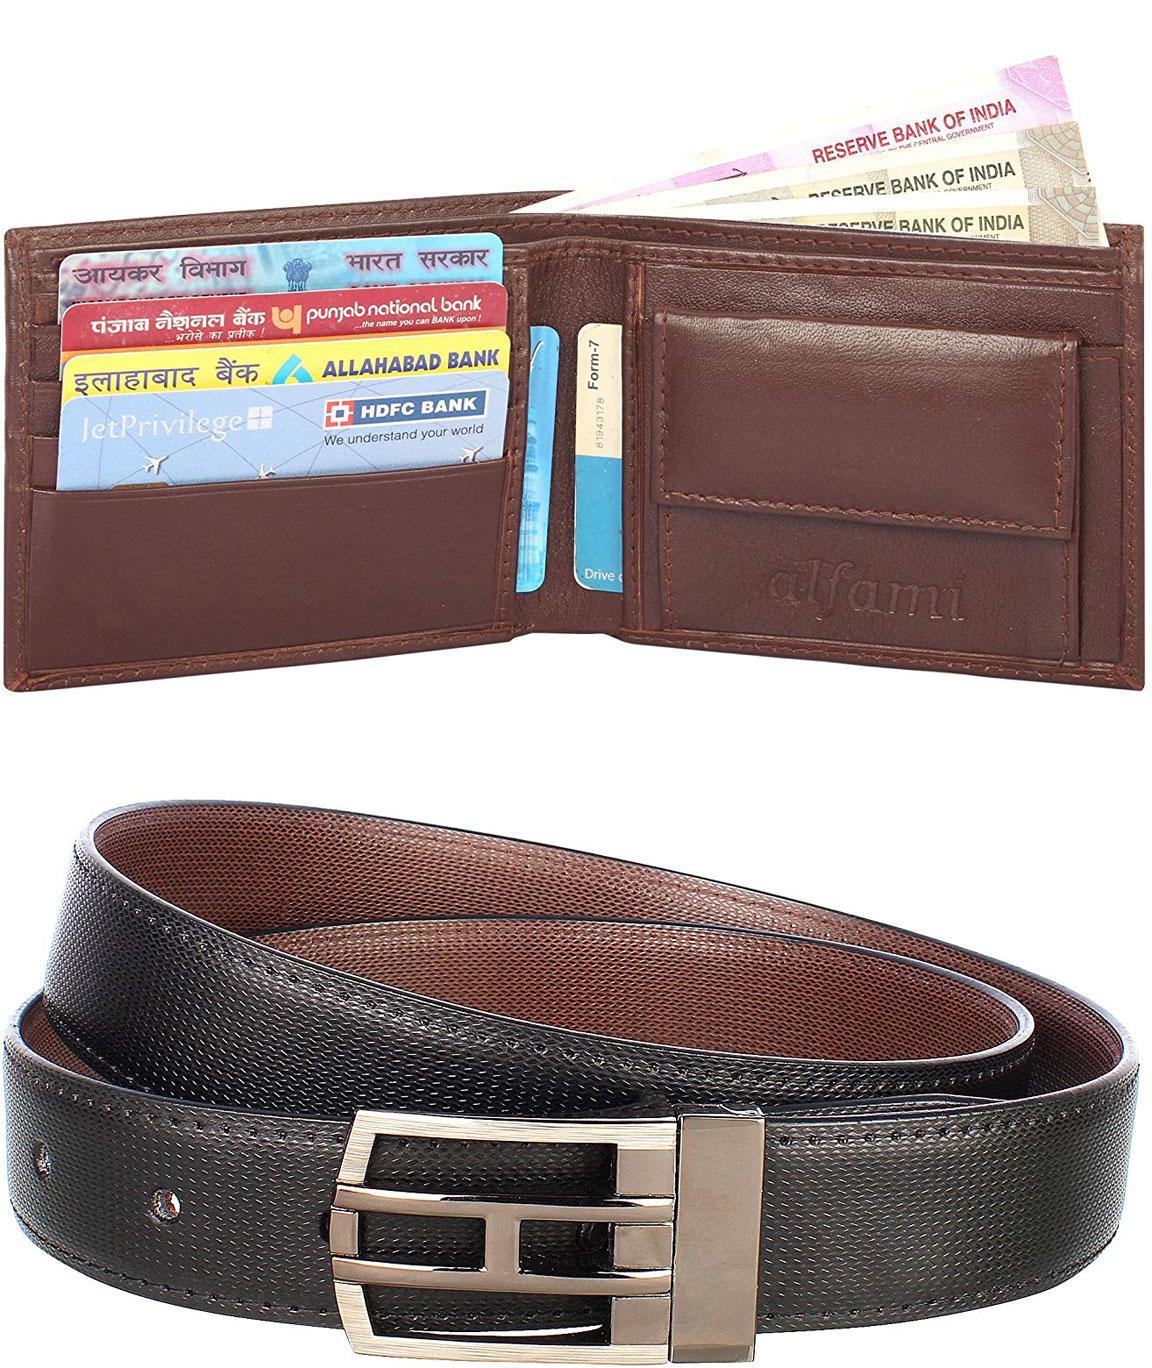 Urban Alfami Reversible Belt and Genuine leather Wallet Combo